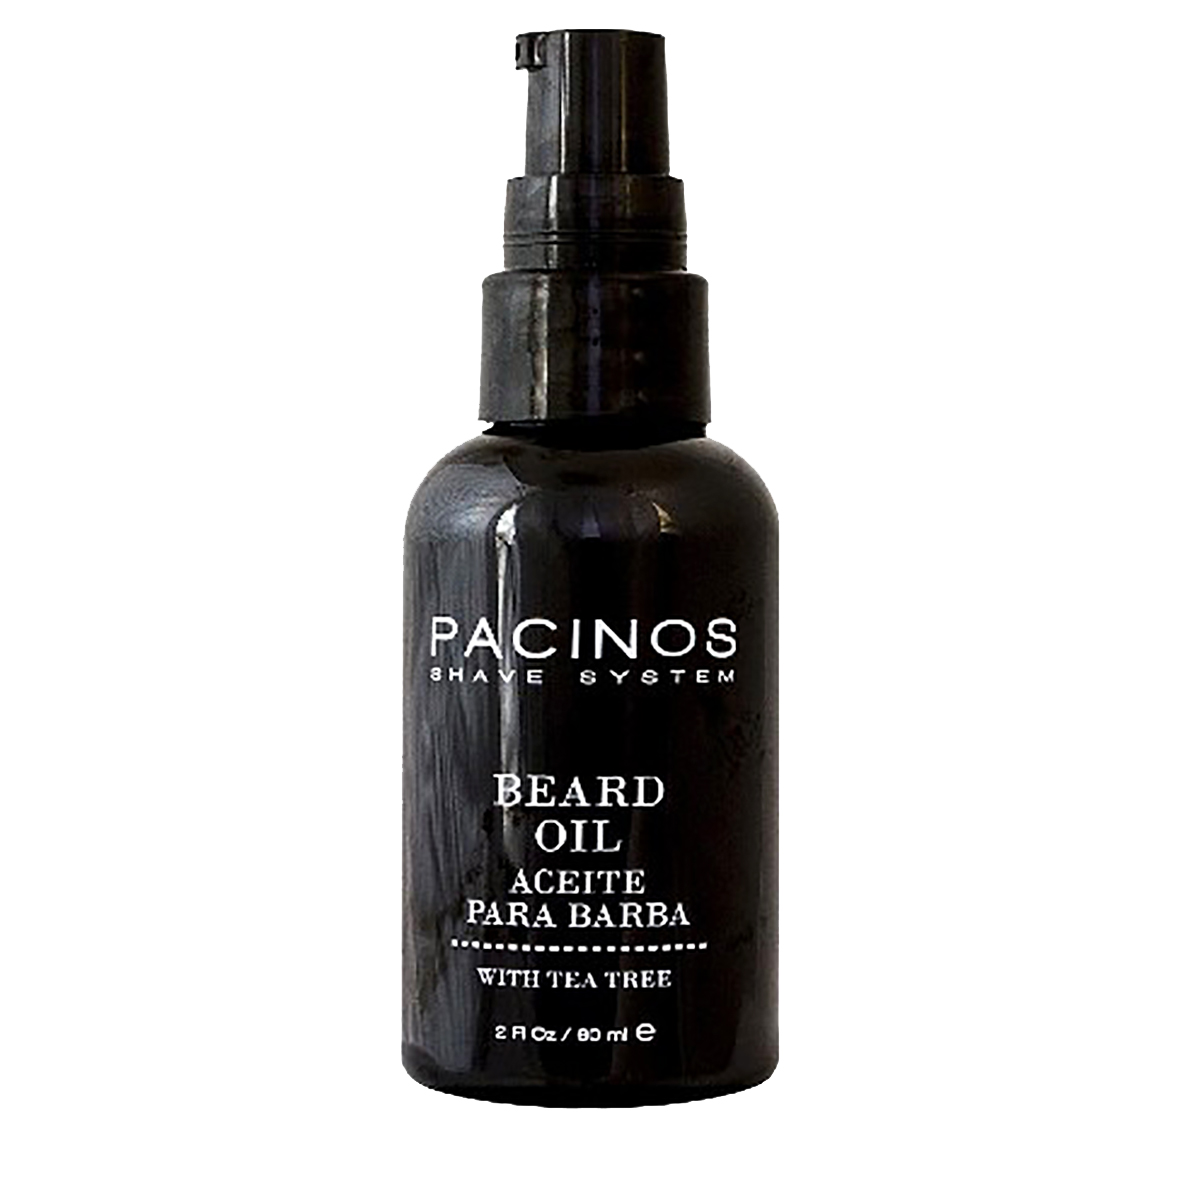 06 Olio da barba Pacinos SL Beard Oil Shave System da 60 ml